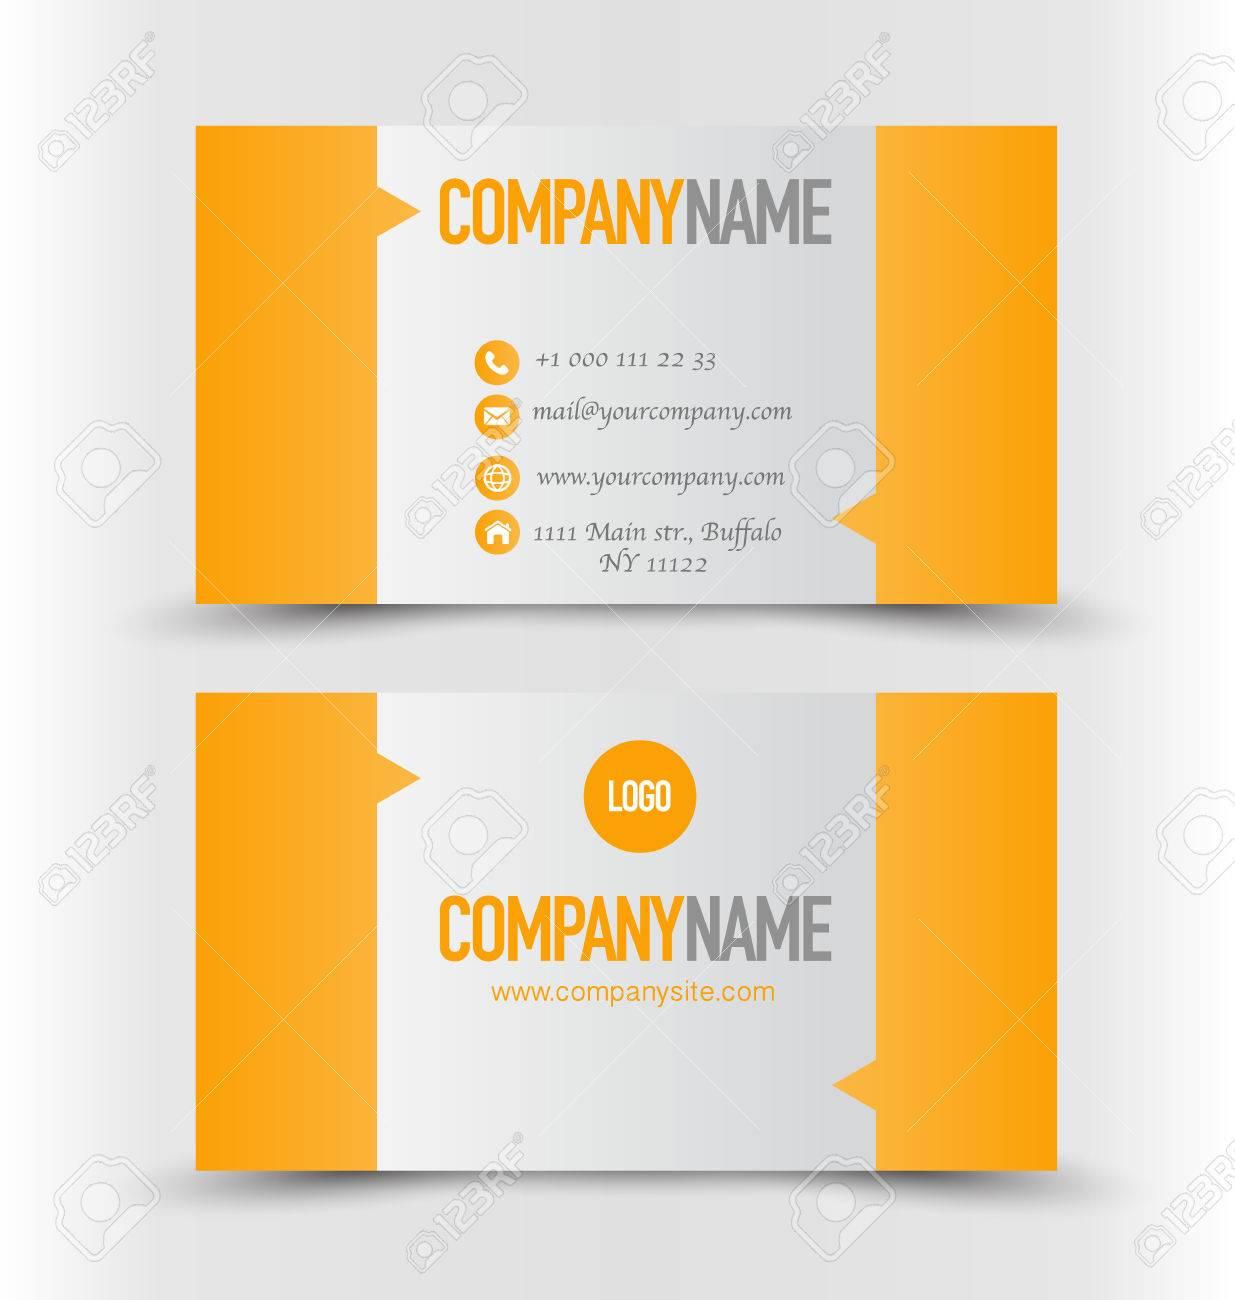 Business cards buffalo ny choice image card design and card template business card design set template for company corporate style business card design set template for company magicingreecefo Choice Image